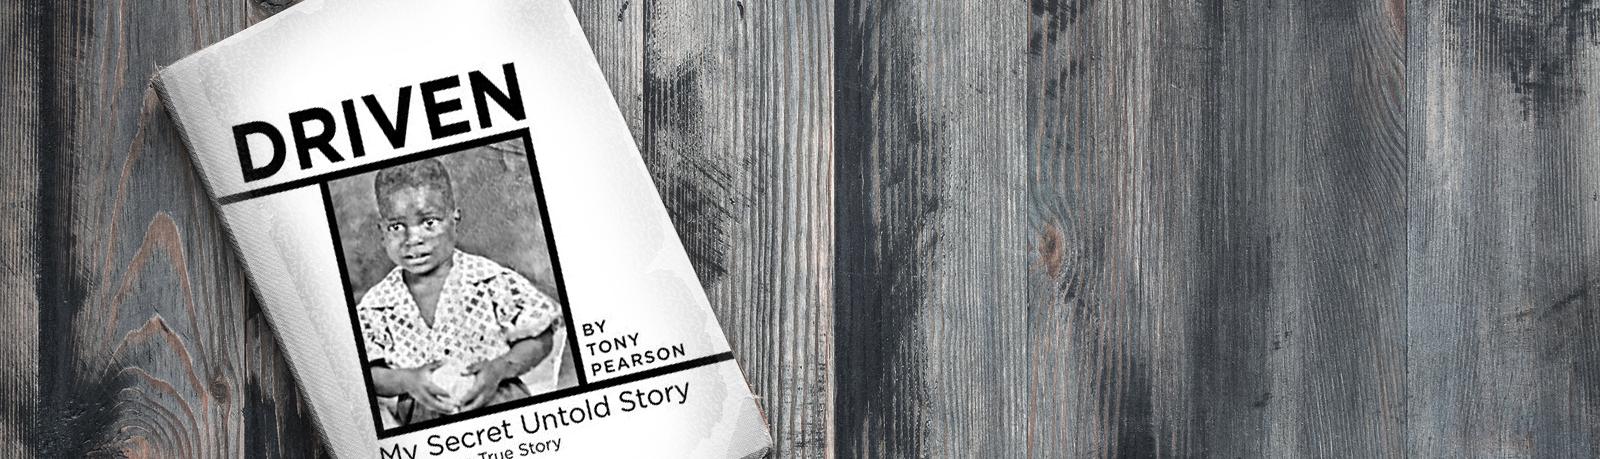 Tony Pearson Memoir, Driven: My Secret Story